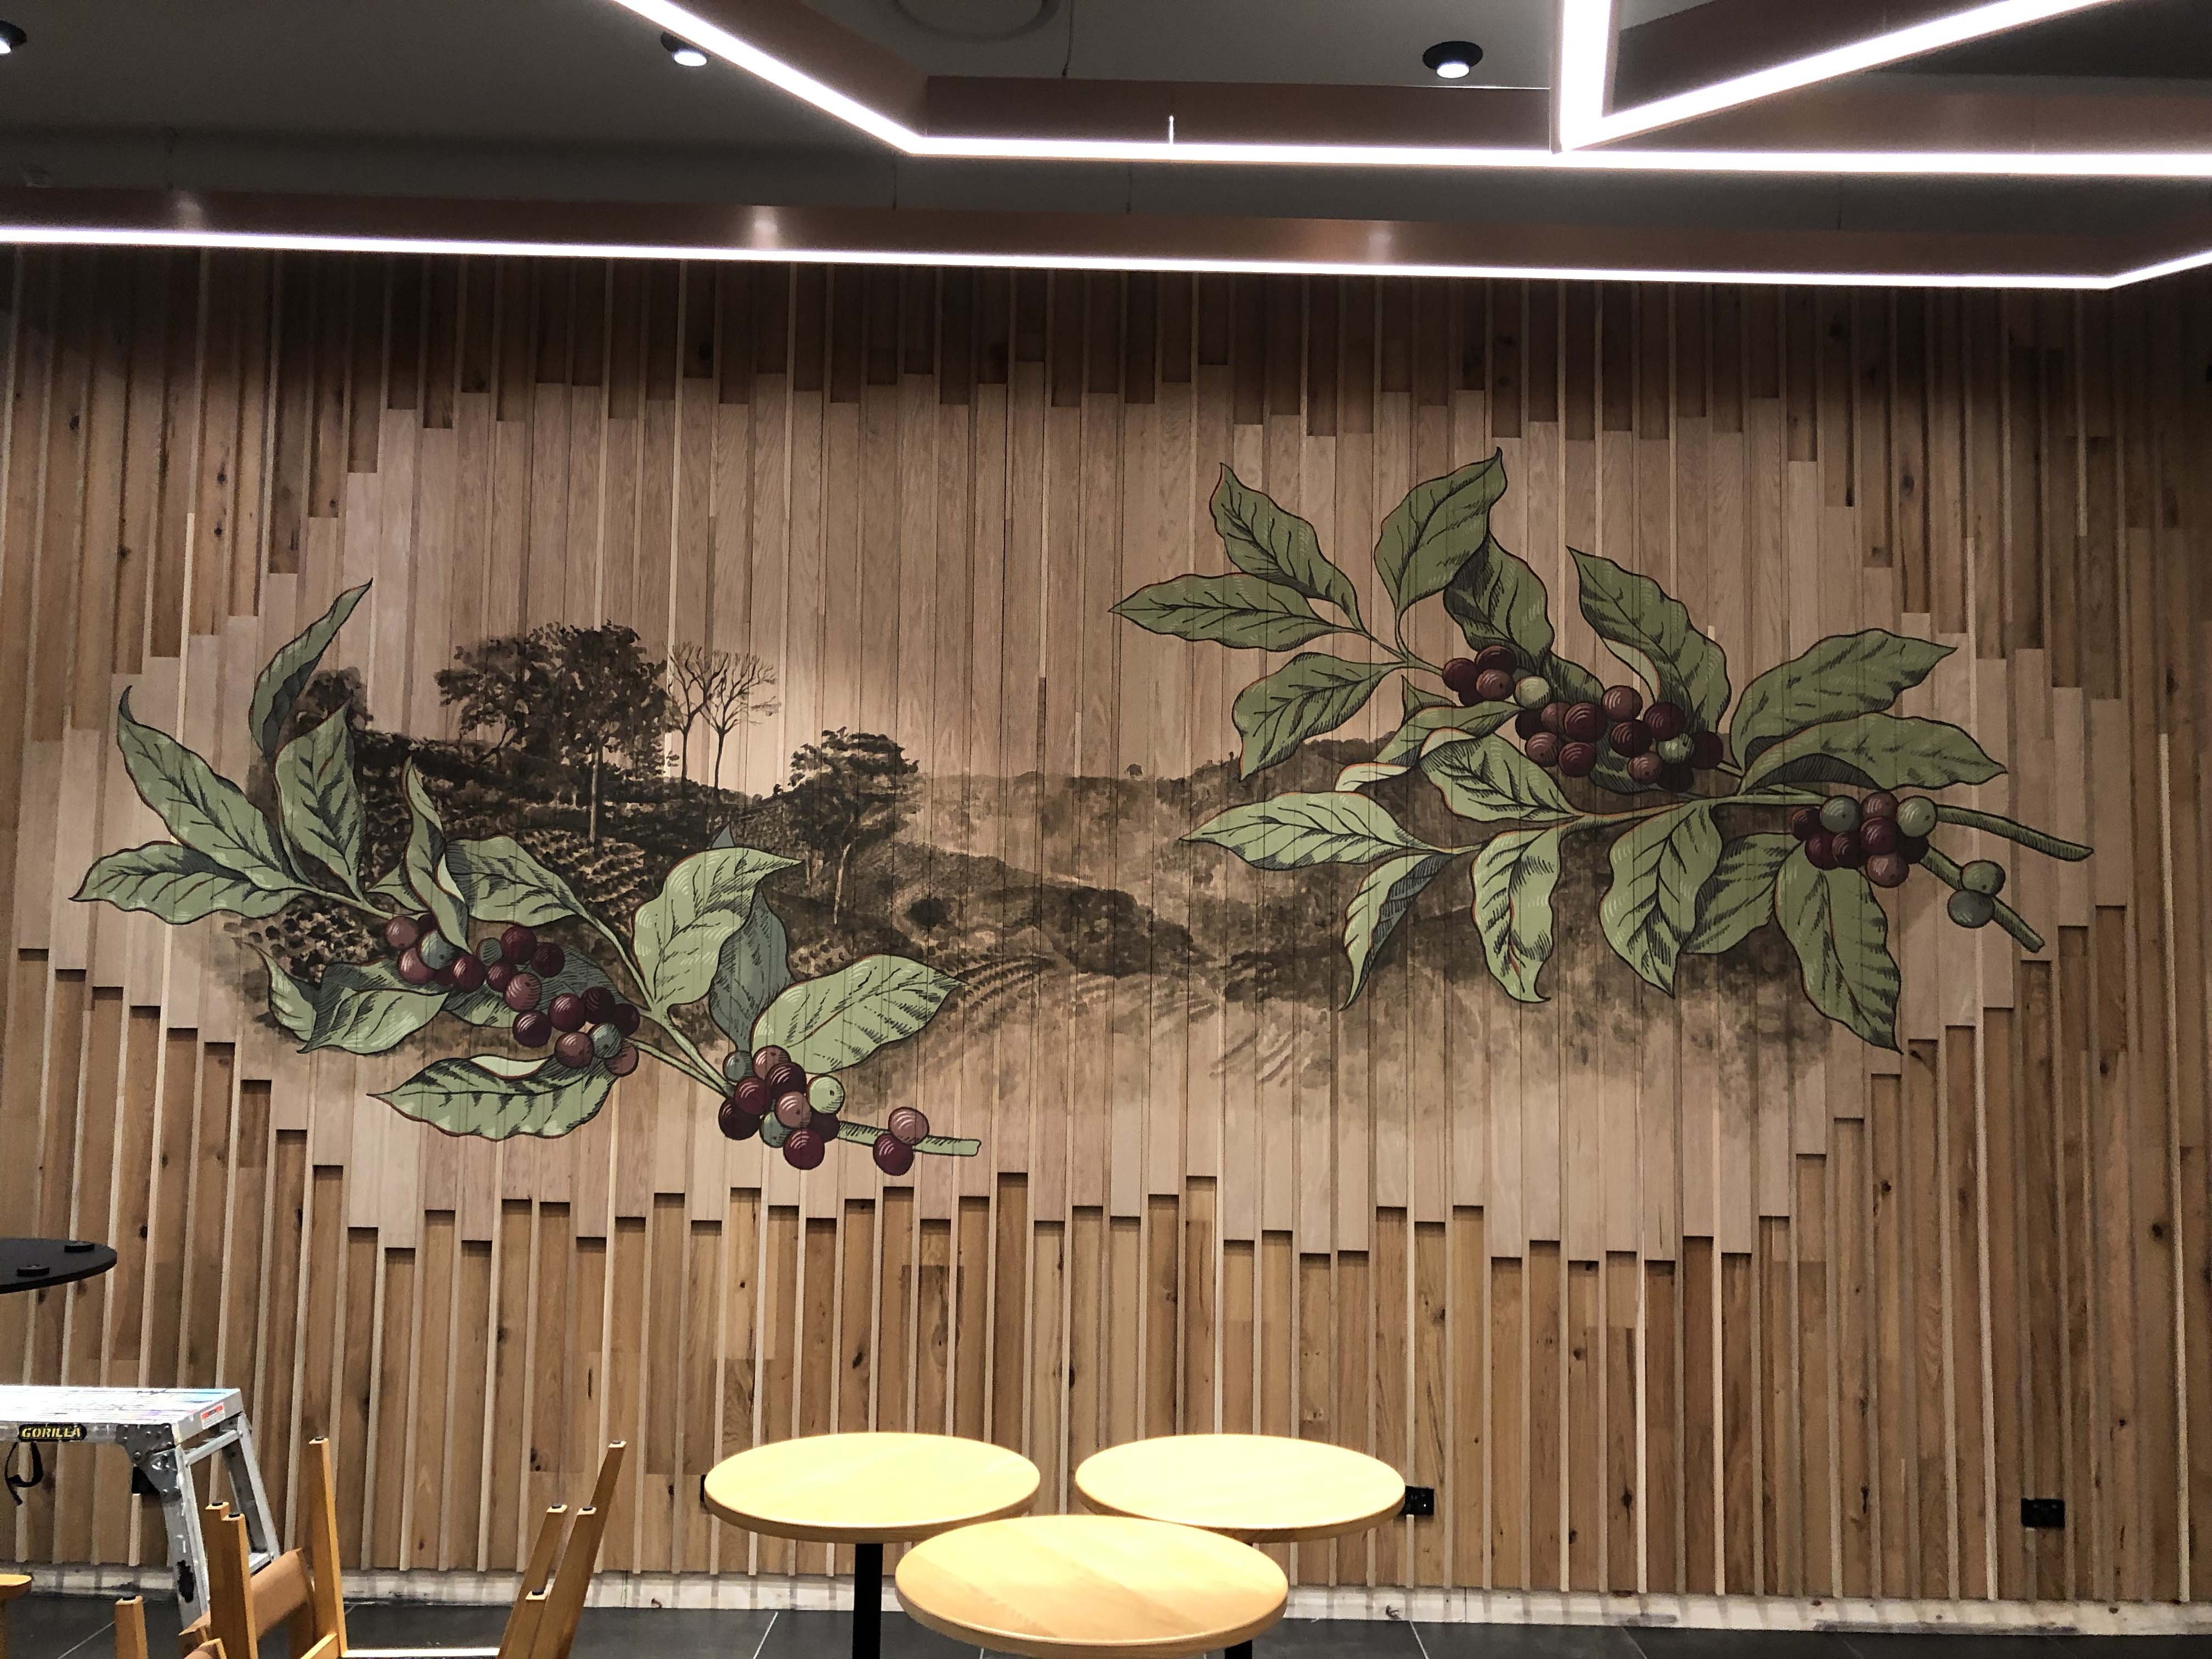 the-art-of-wall-burwood-botanical-coffee-branch-plantation-wall-art-mural-3